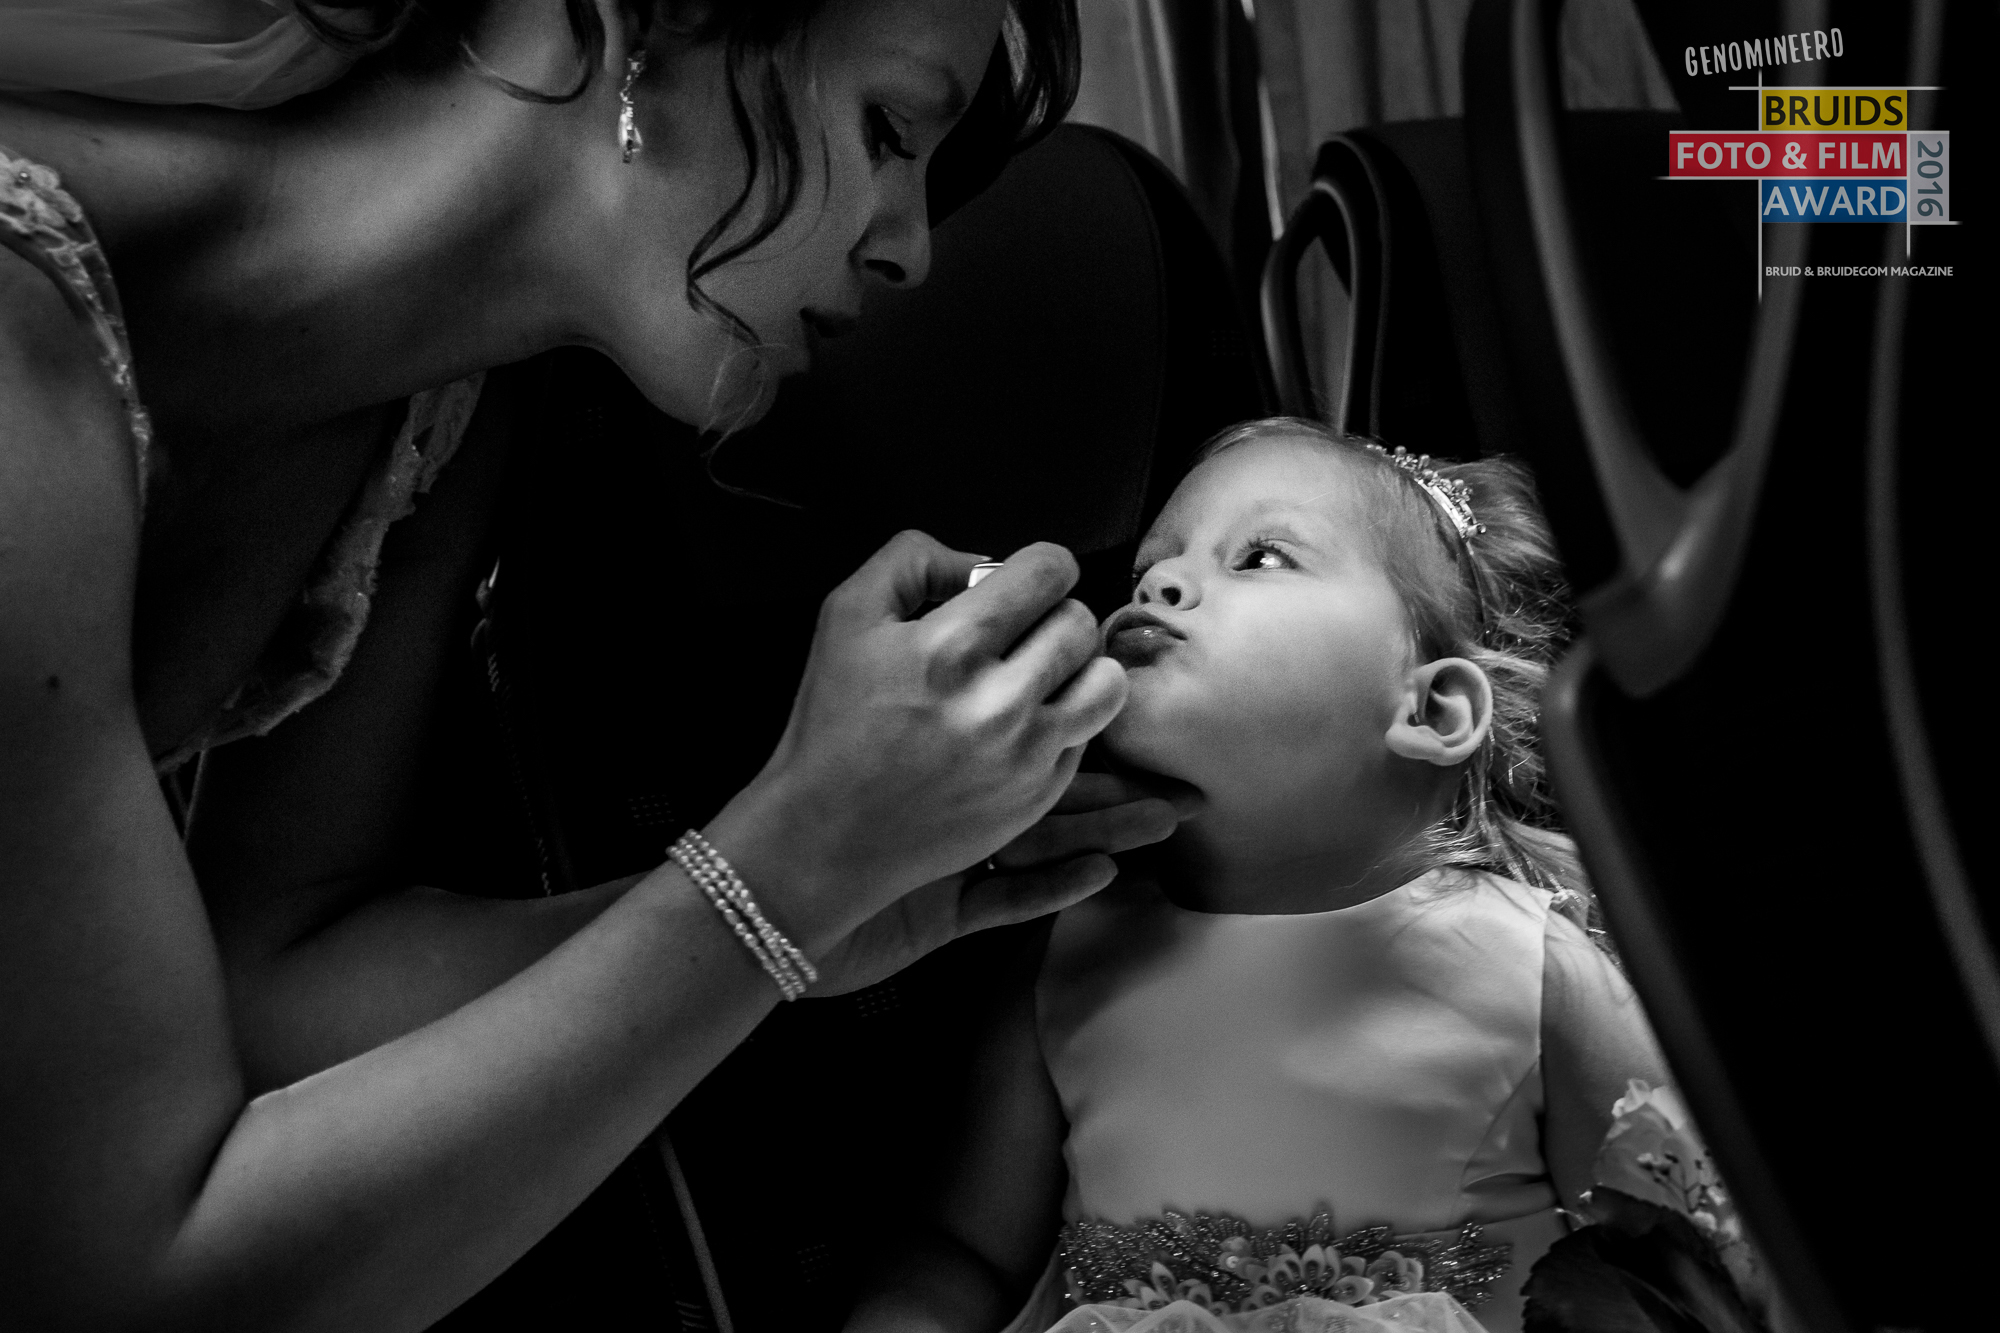 BFA - Bruidskinderen - Marieke Zwartscholten fotografie - 2